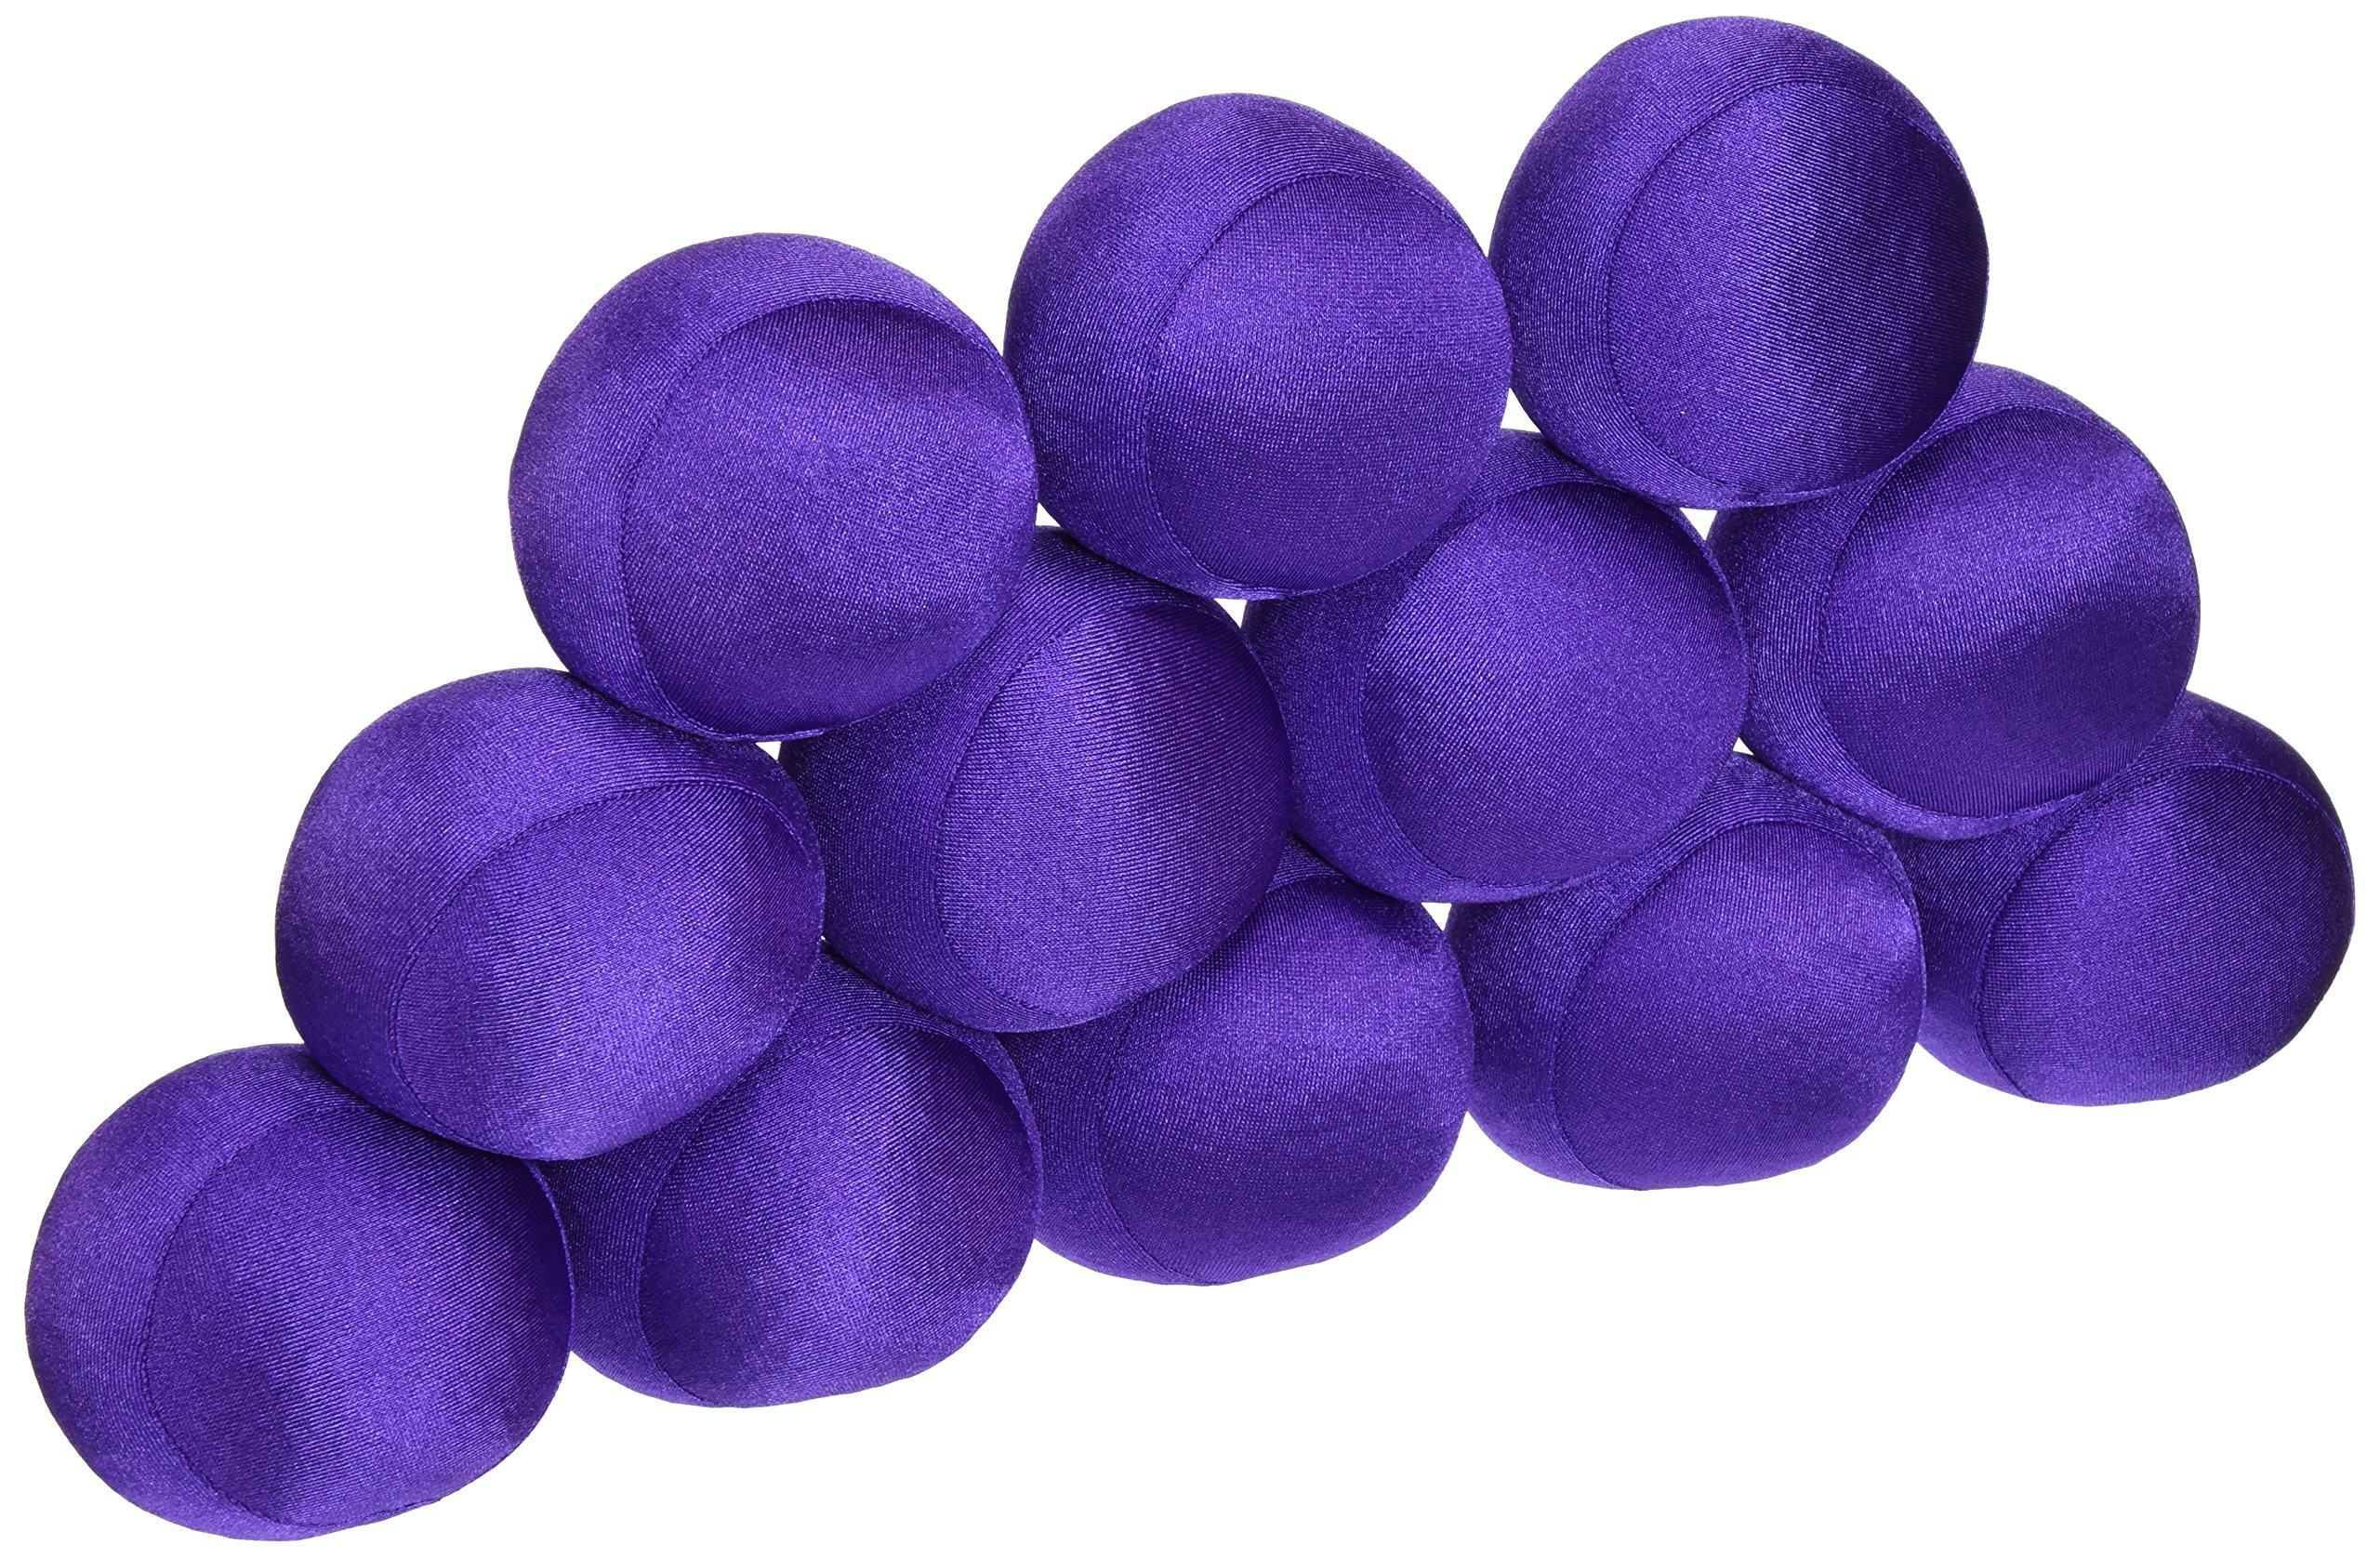 Lavender Luvies Lavender Stress Balls, Purple - 12 Pack